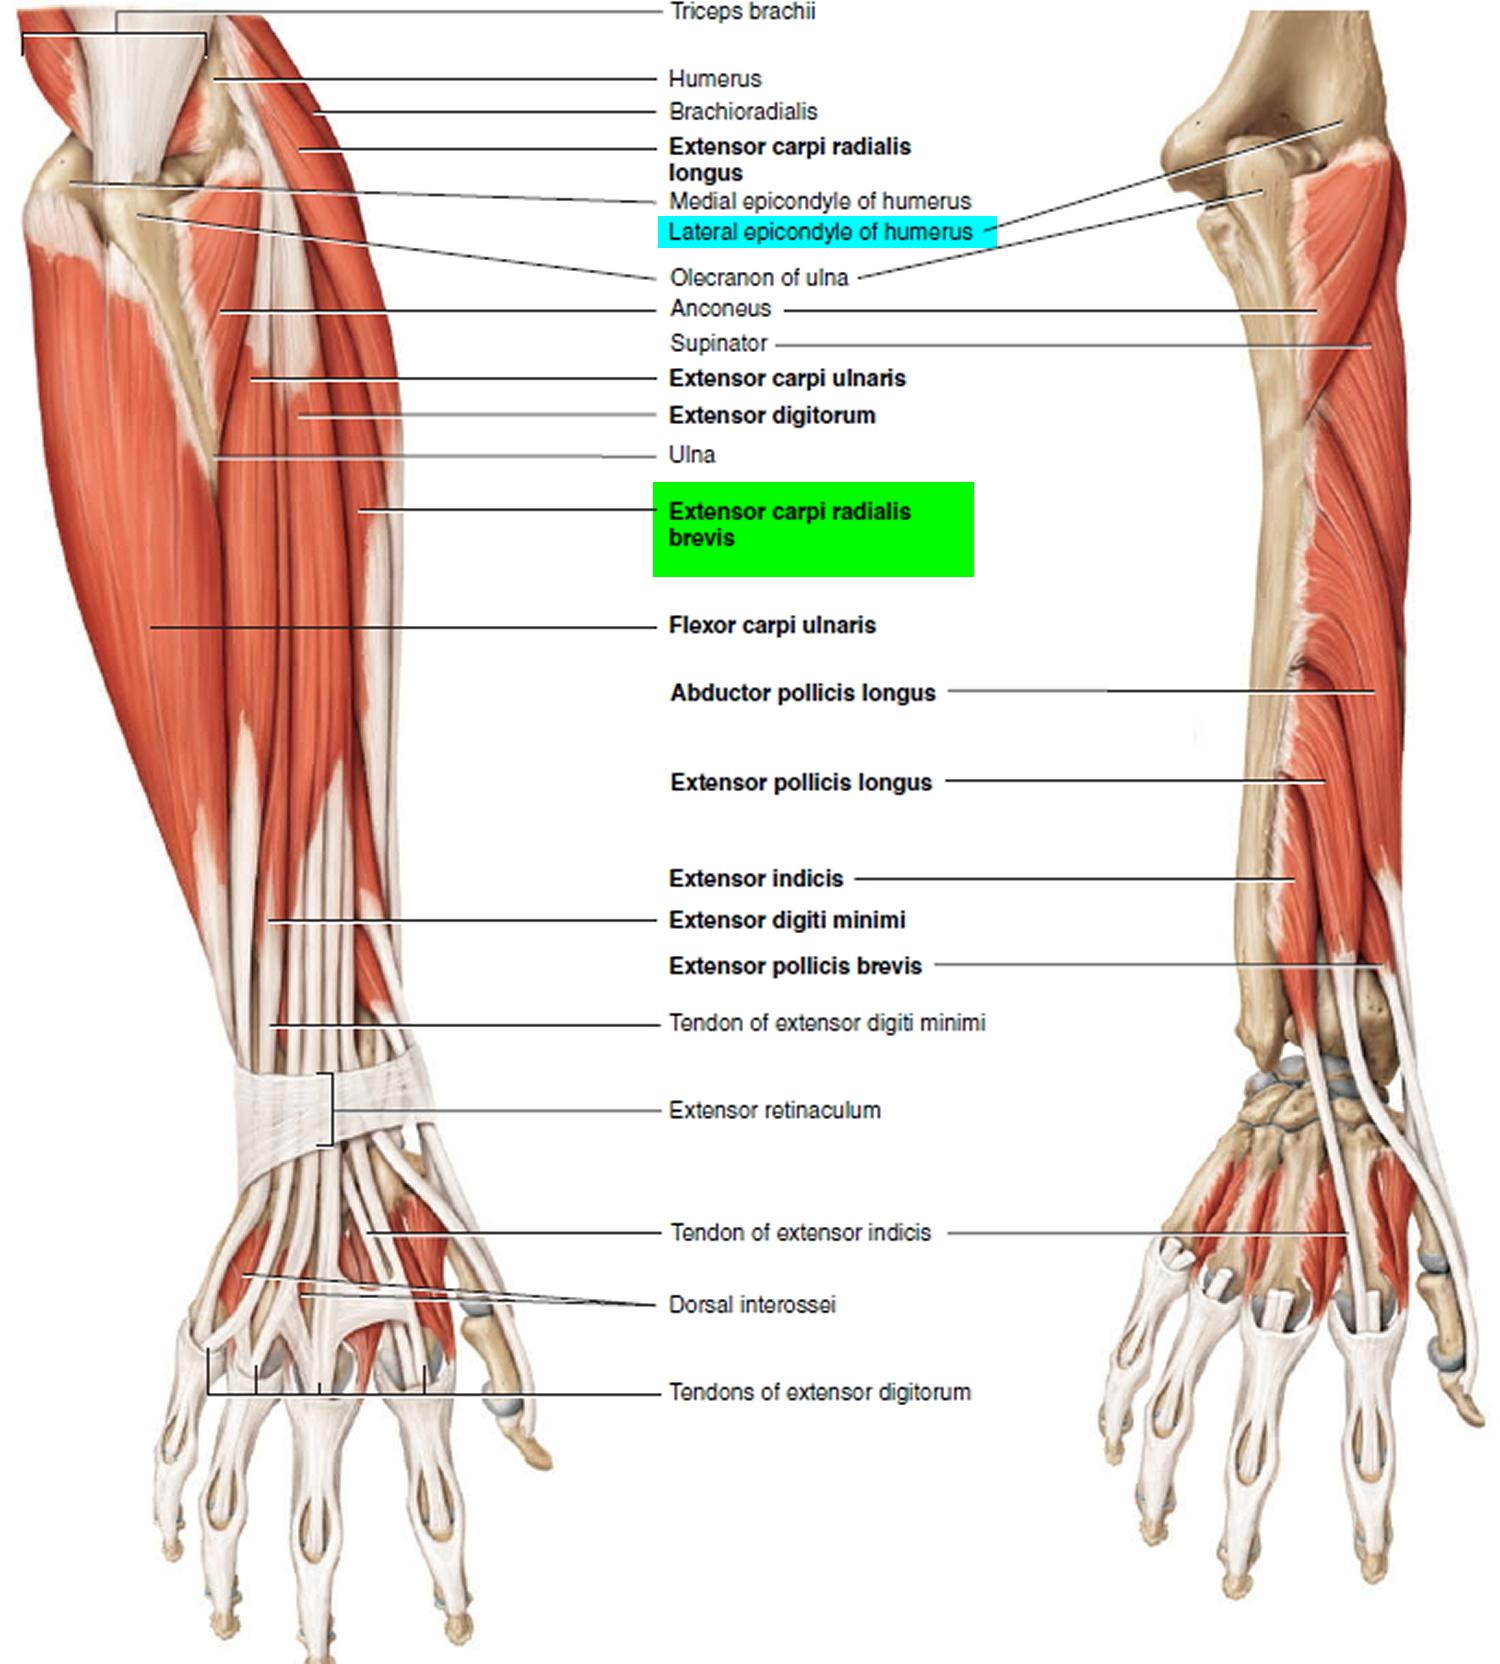 Tendonitis - Patellar, Peroneal, Knee, Foot, Wrist, Biceps, Shoulder ...